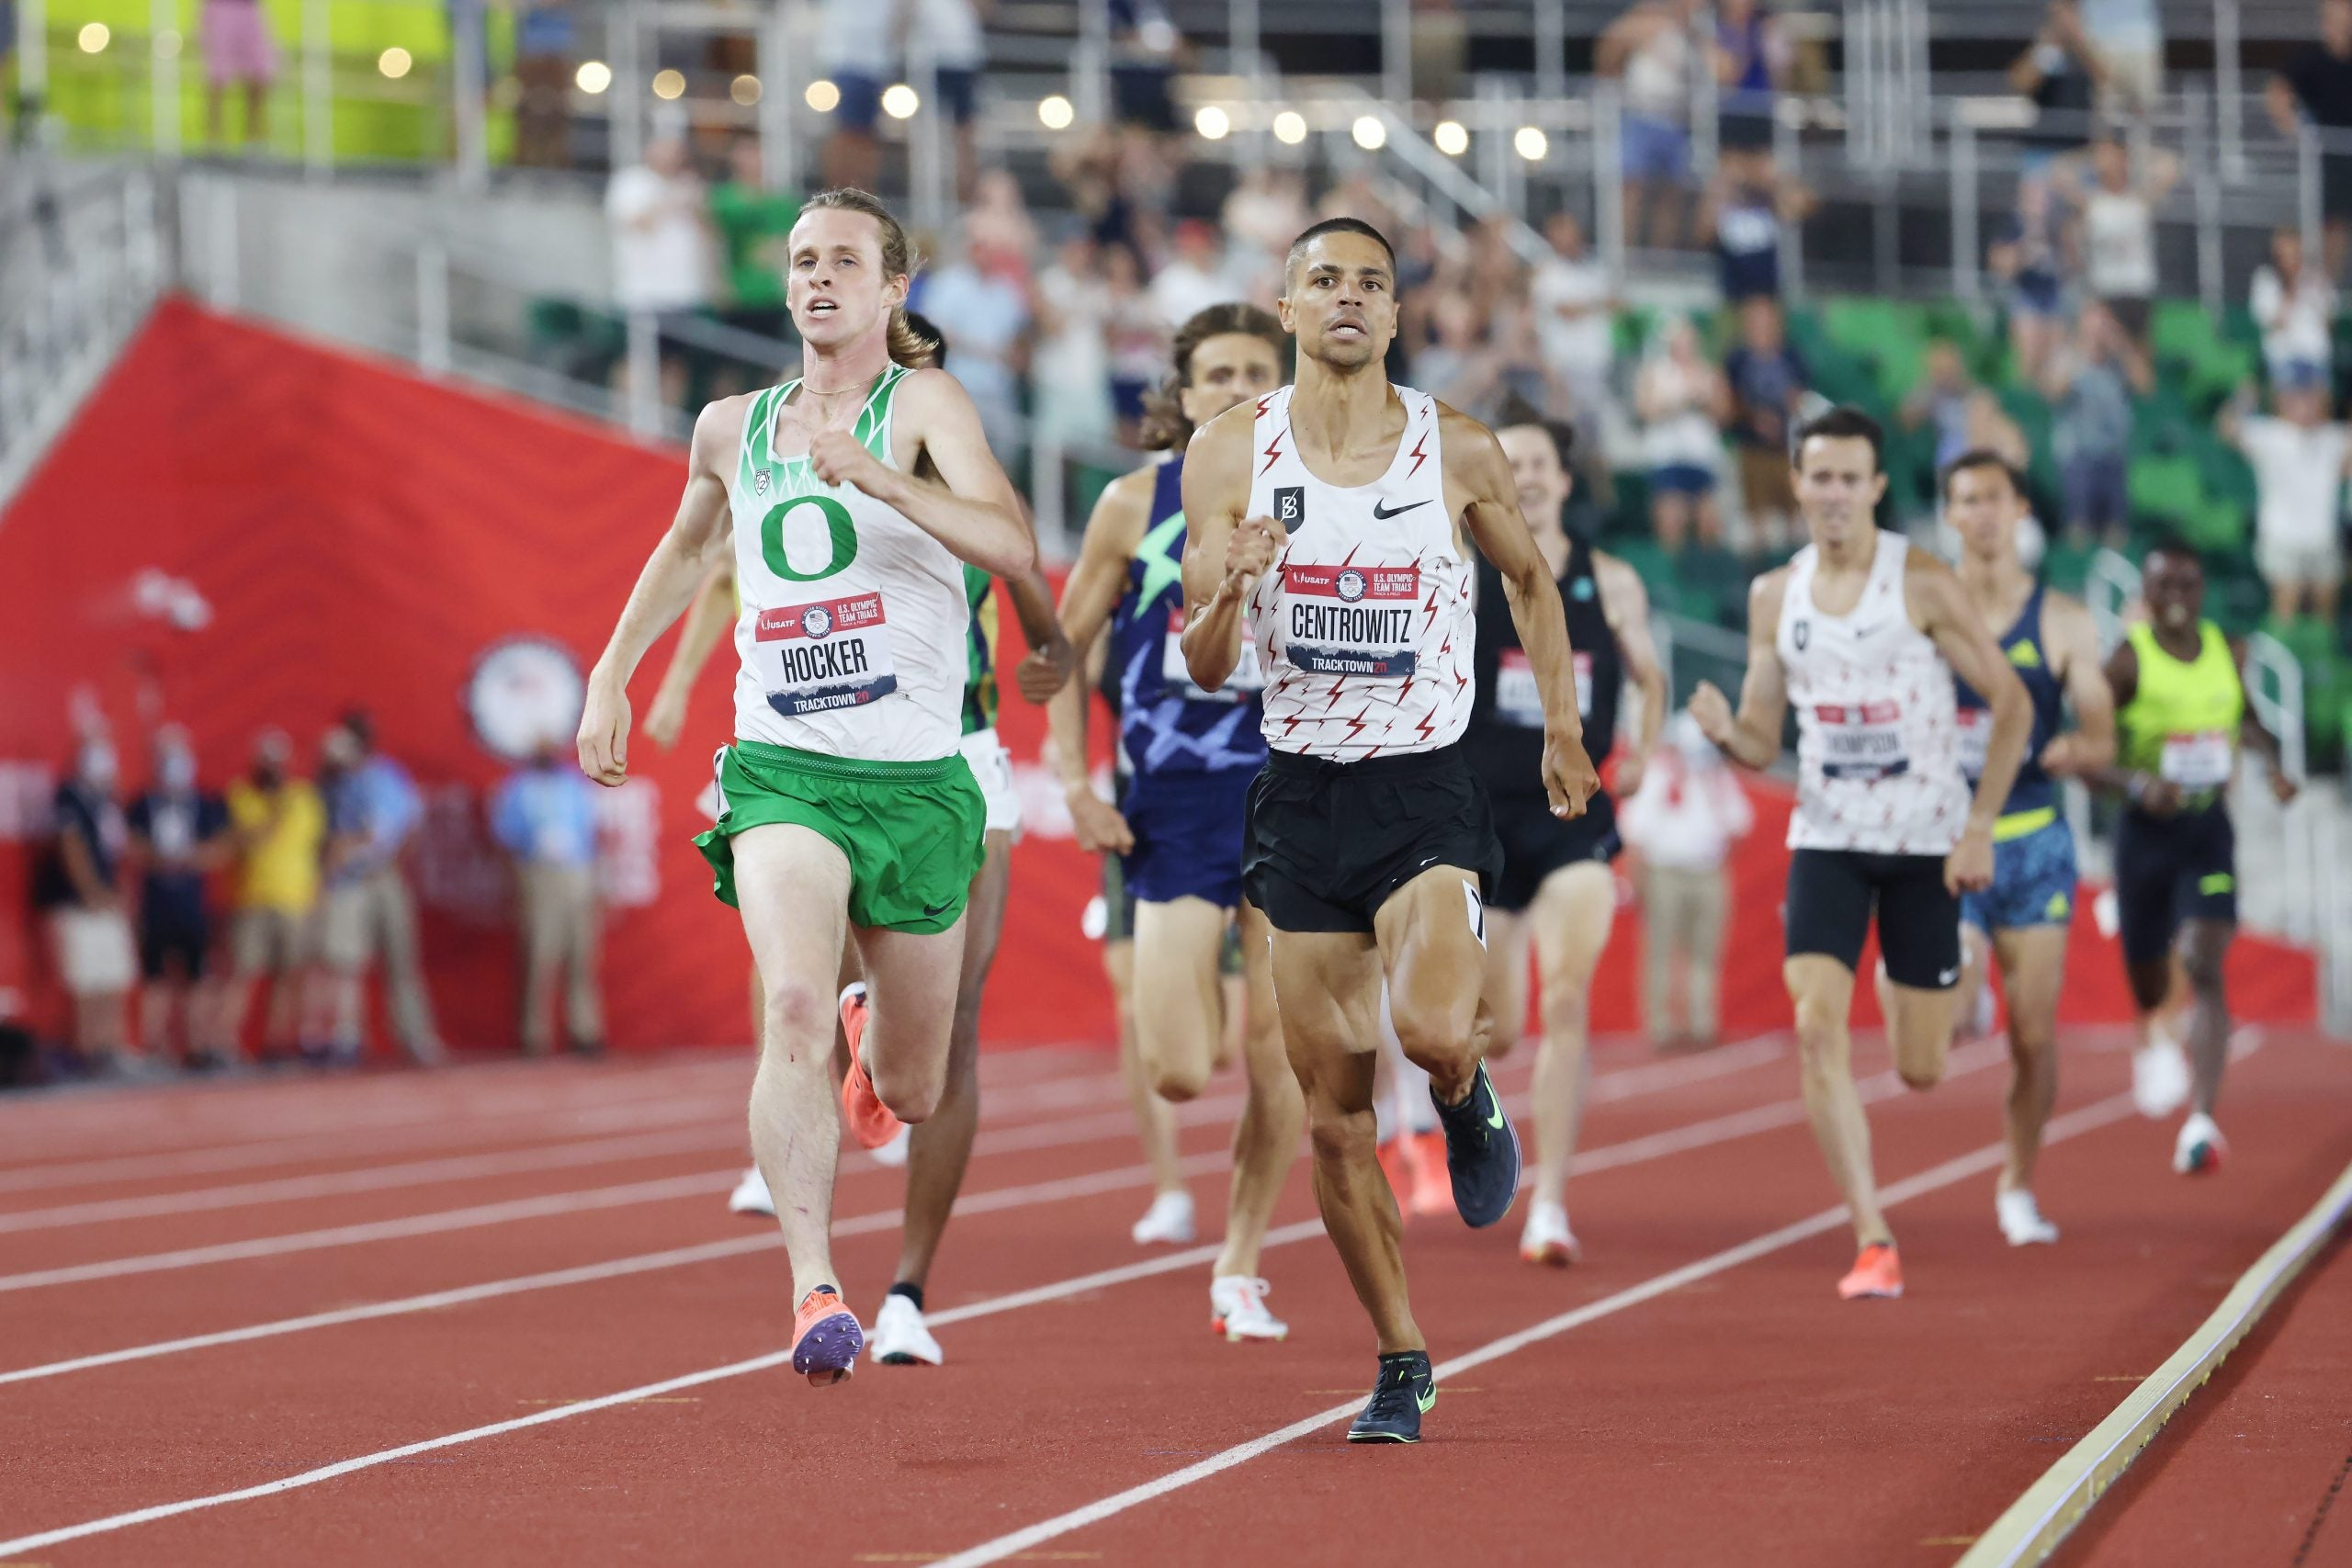 Men running on track in 1500 final in 2020 Trials.